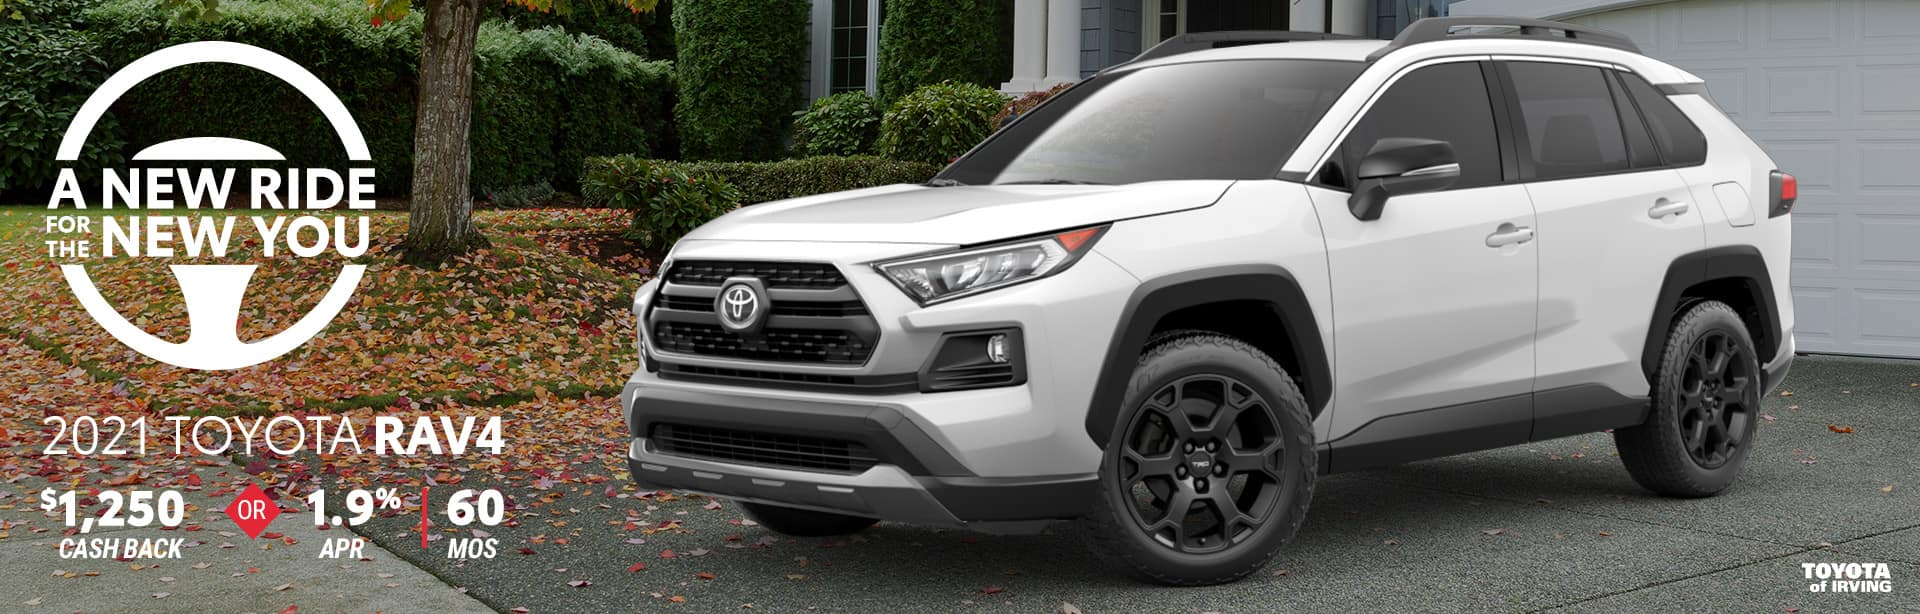 2021 Toyota Rav4 April Incentives